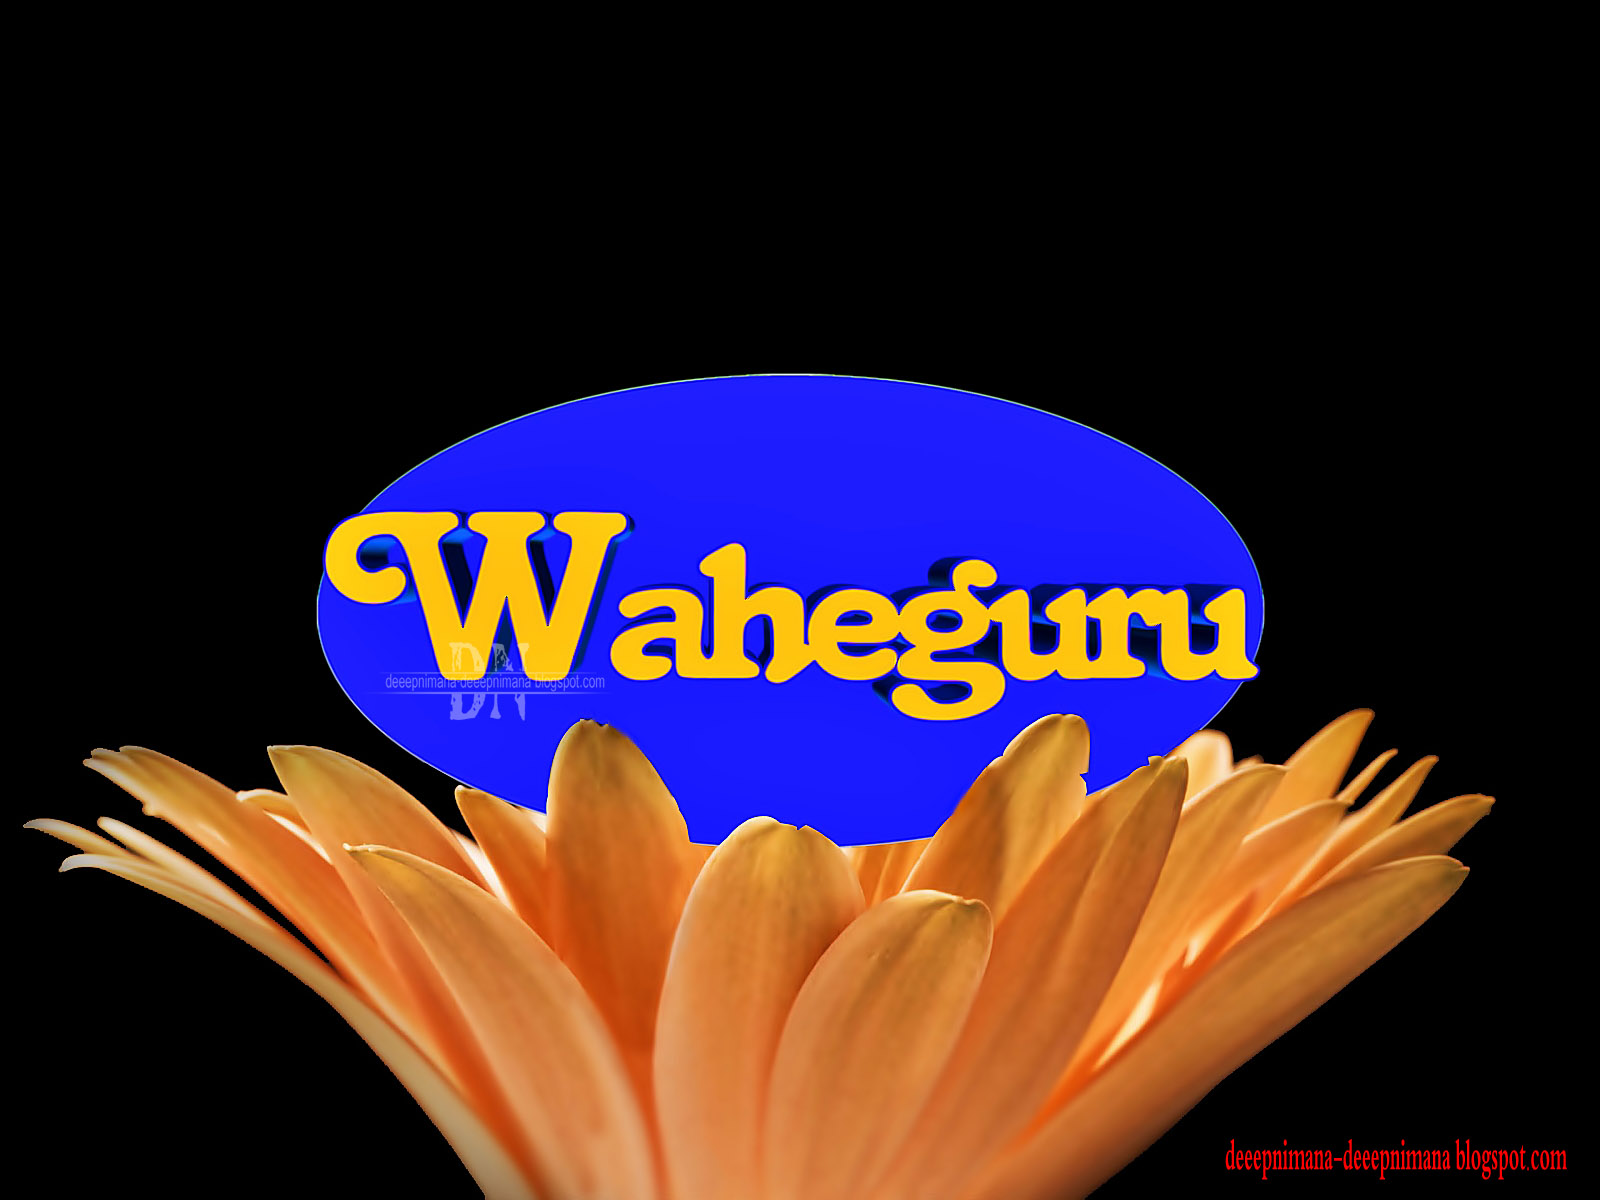 deeepnimana-deeepnimana blogspot.com: waheguru